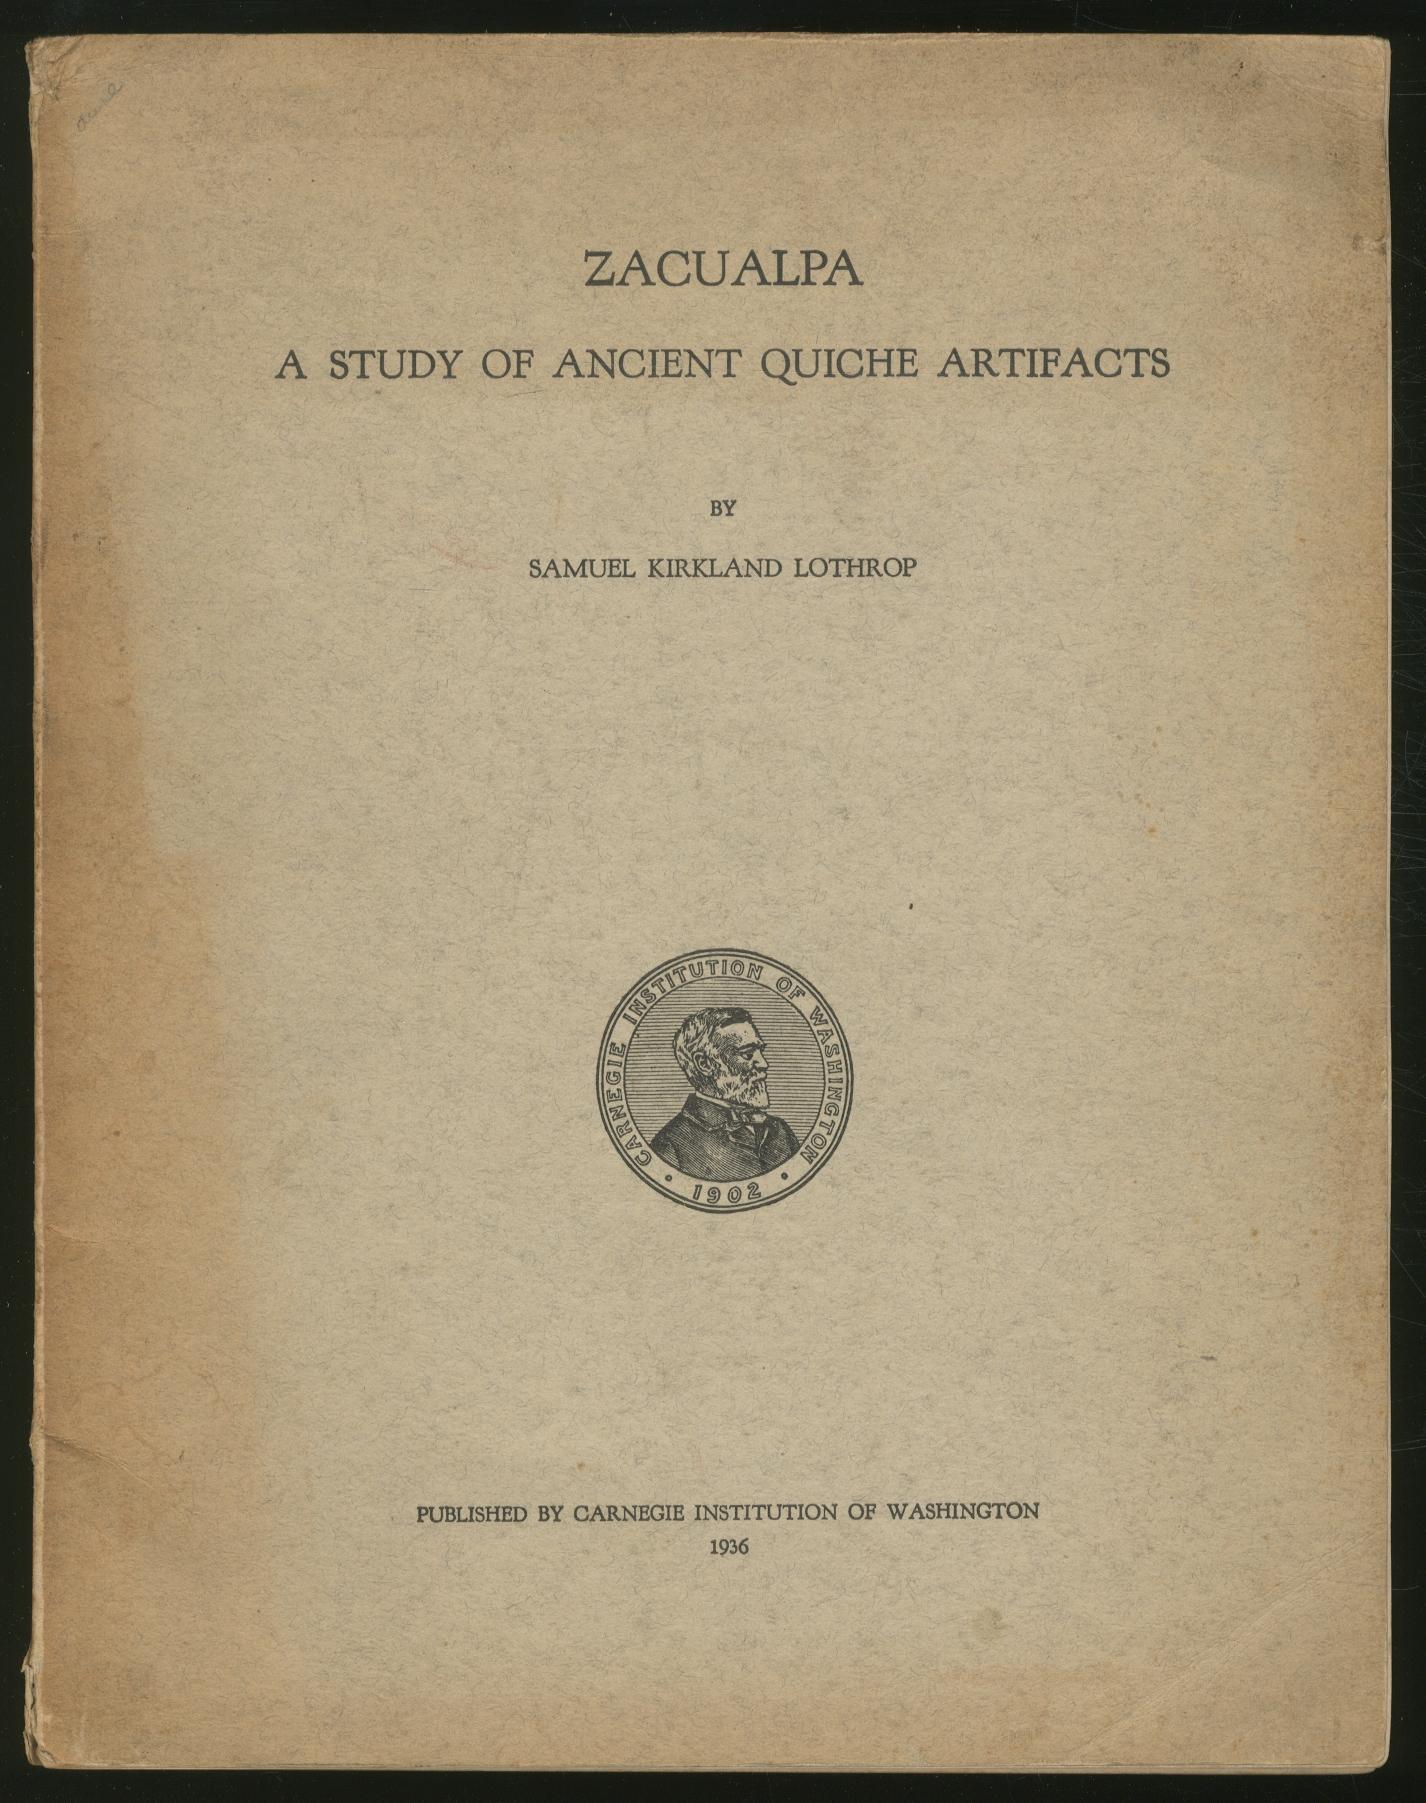 Zacualpa: A Study of Ancient Quiche Artifacts: LOTHROP, Samuel Kirkland